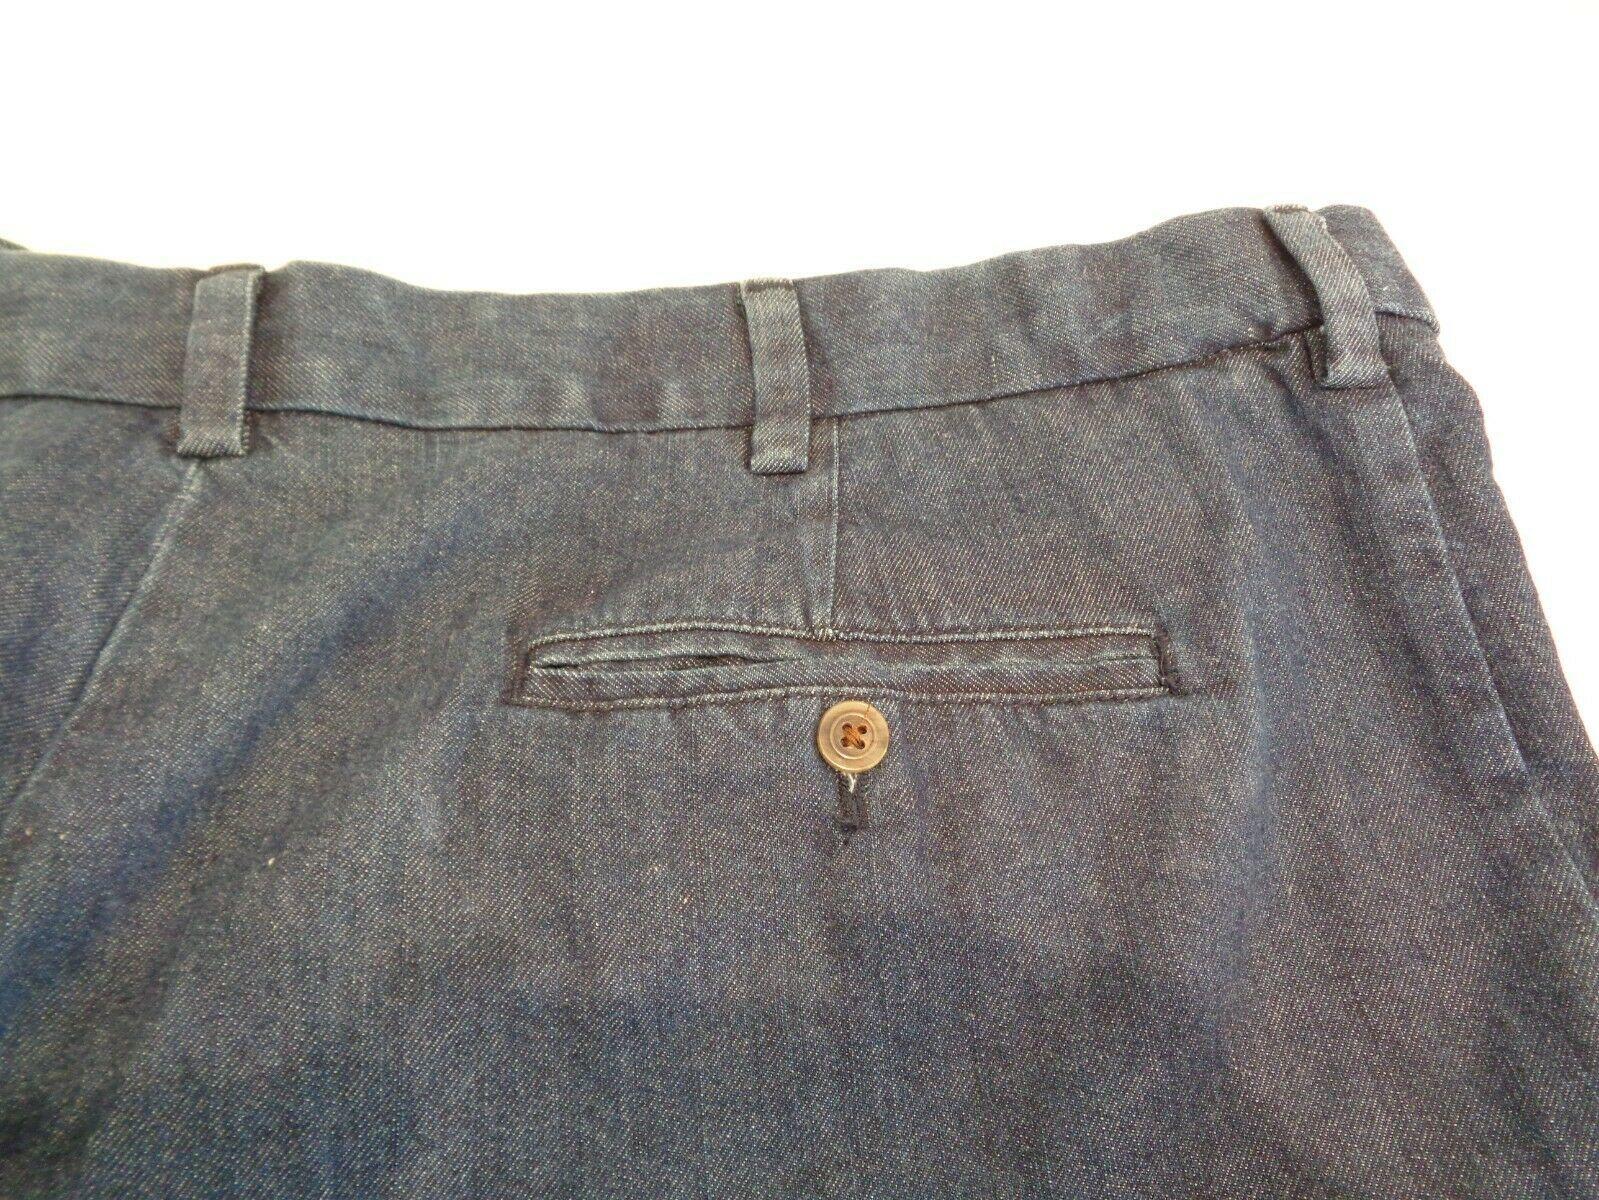 Roundtree & Yorke Size 46 EXPANDER WAISTBAND Denim Flat Front New Mens Shorts